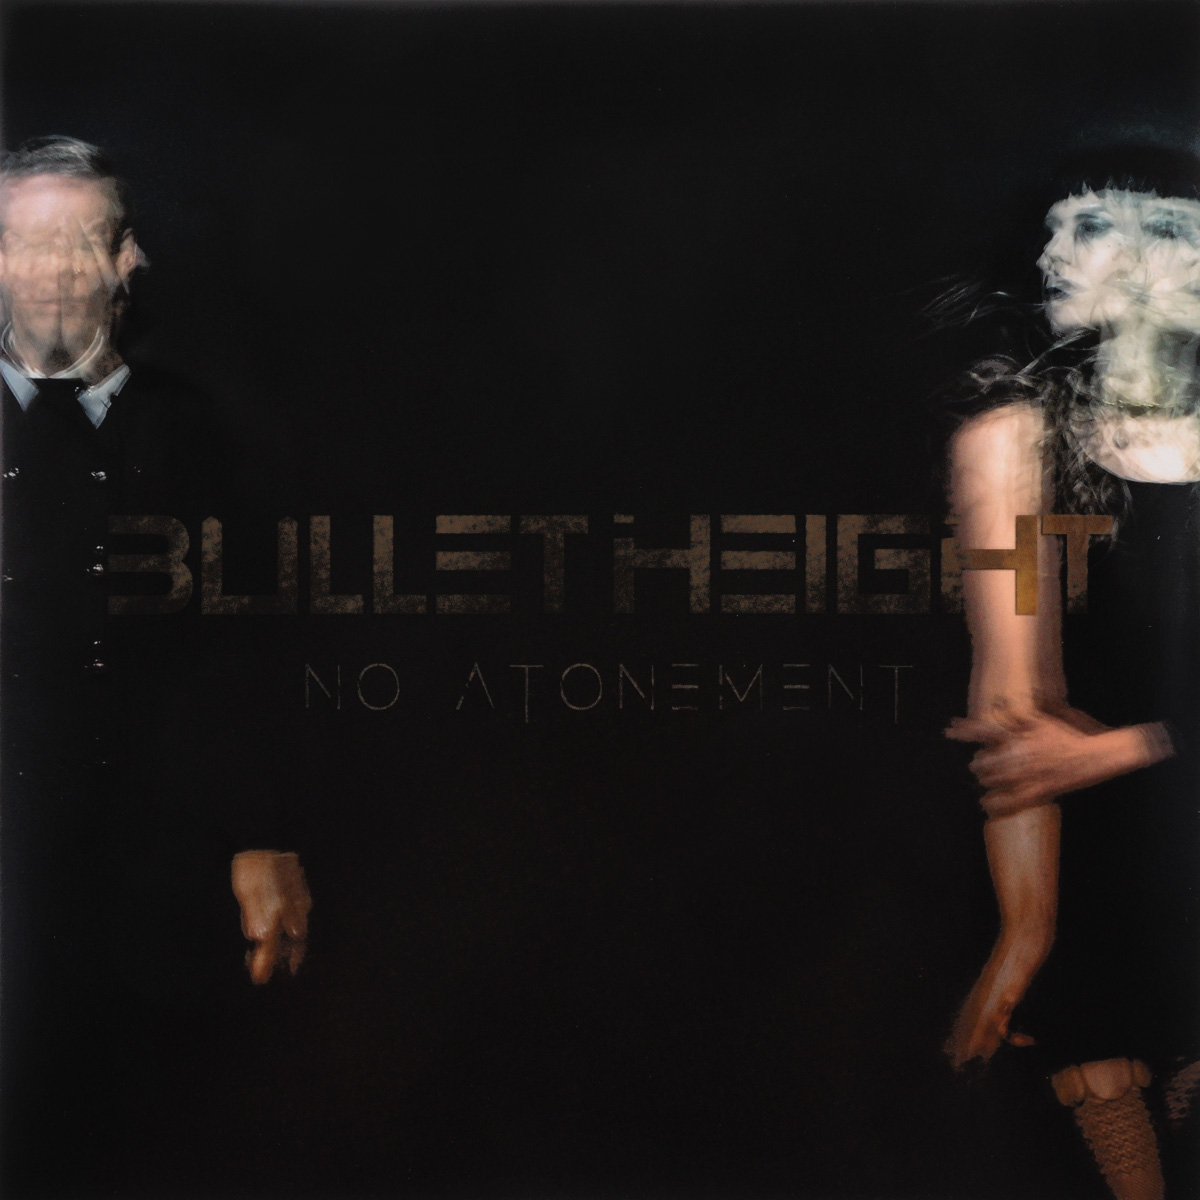 Bullet Height Bullet Height. No Atonement (LP + CD) bullet height bullet height no atonement lp cd